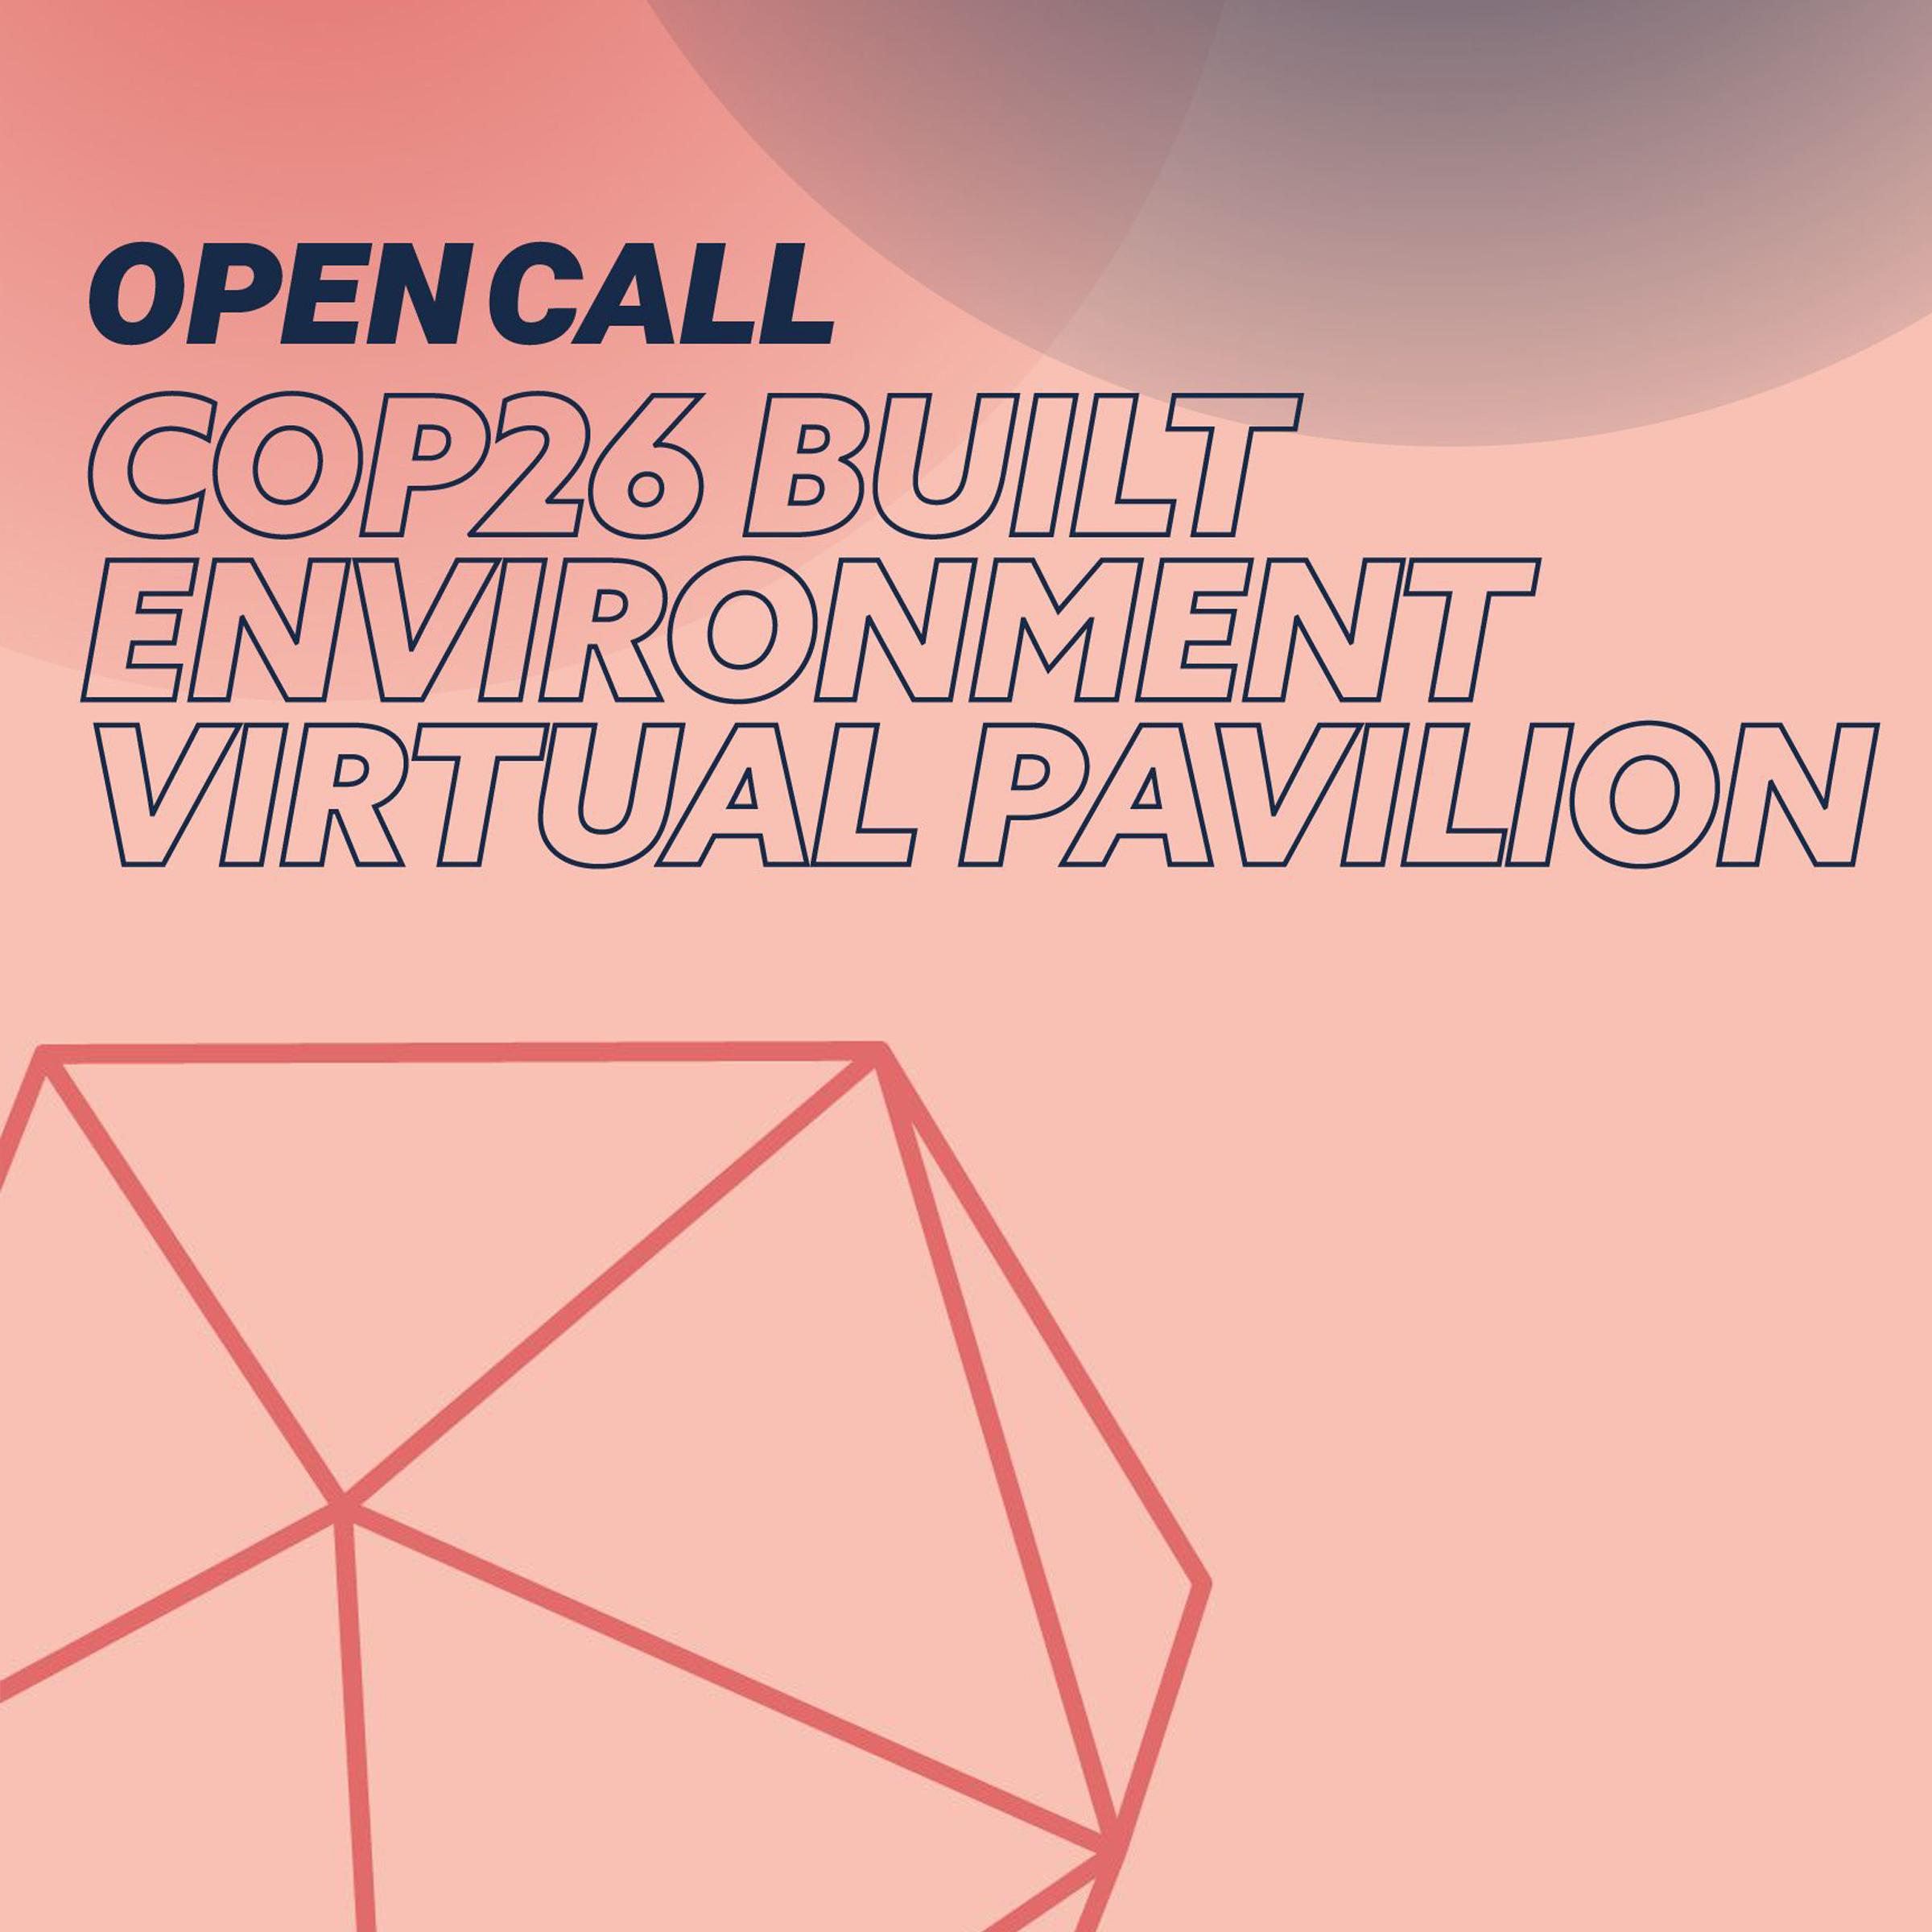 Open call launches for COP26 Built Environment Virtual Pavilion